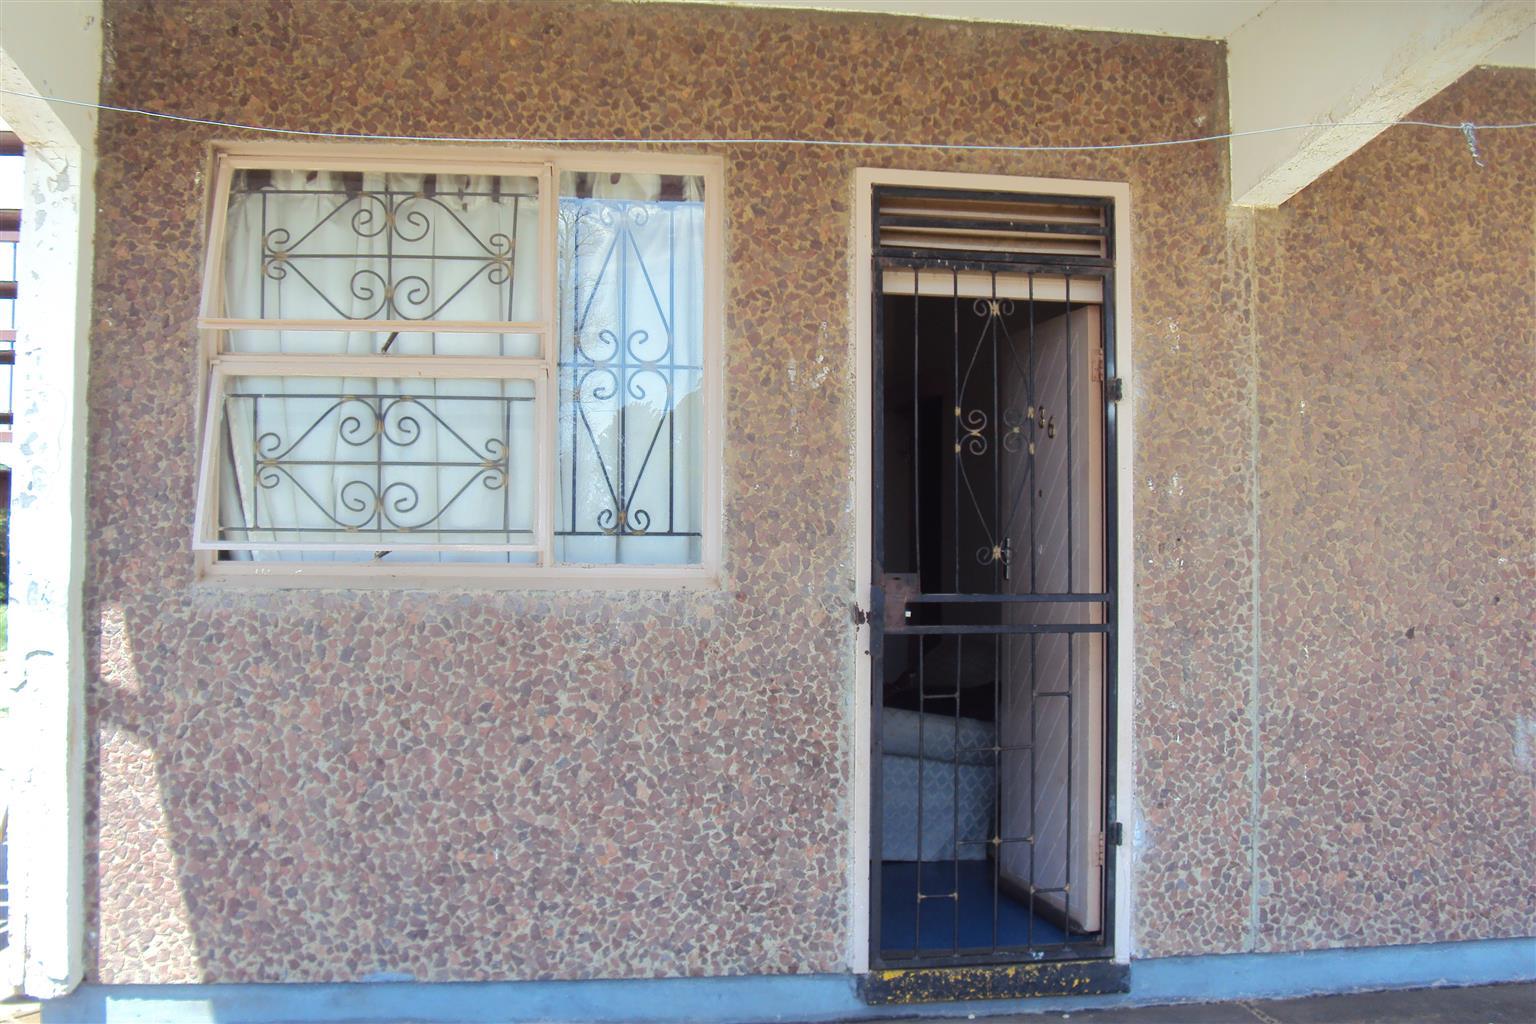 Flat for sale in Reahola Bedelia Welkom